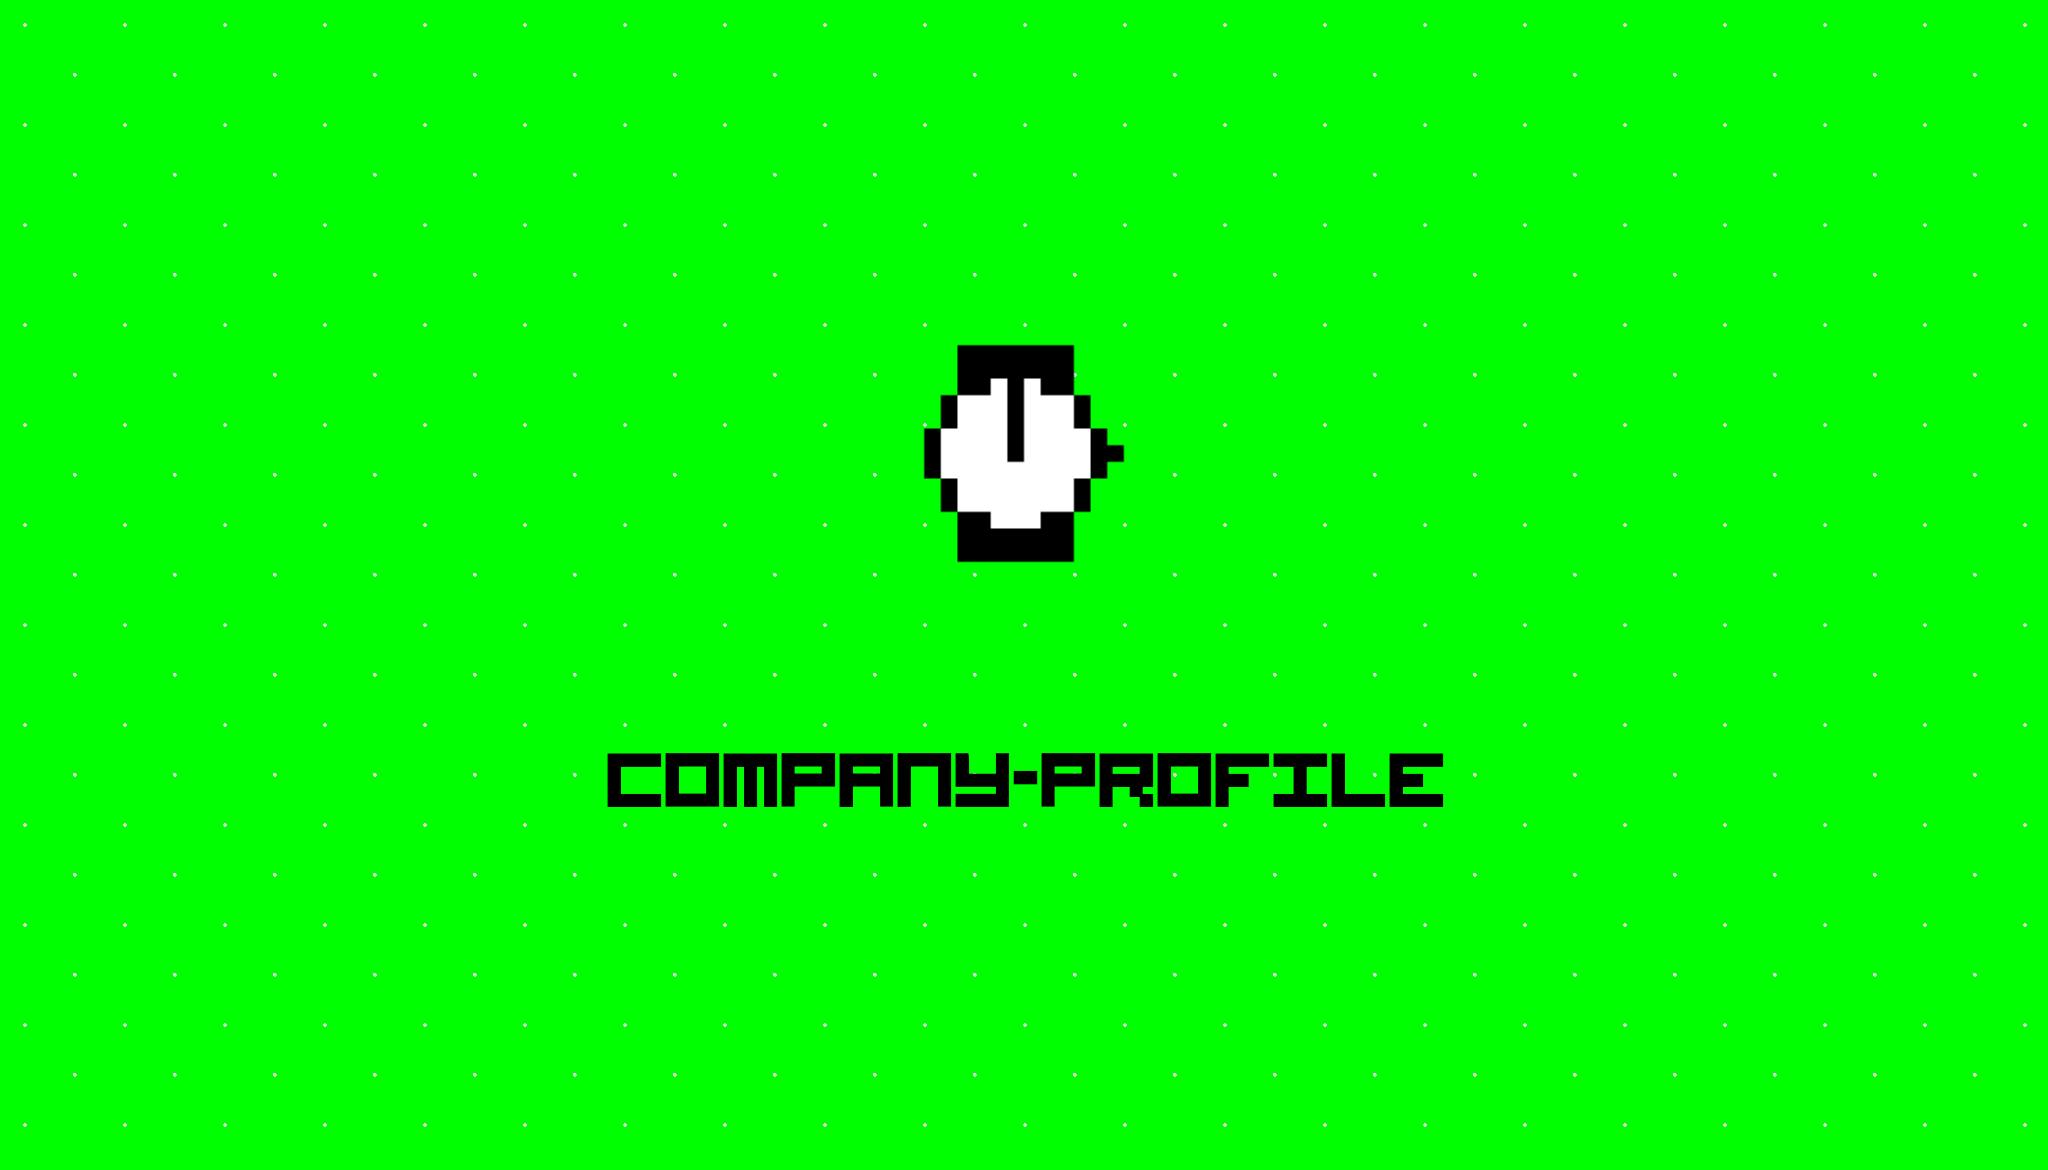 #company-profile stories | Hacker Noon